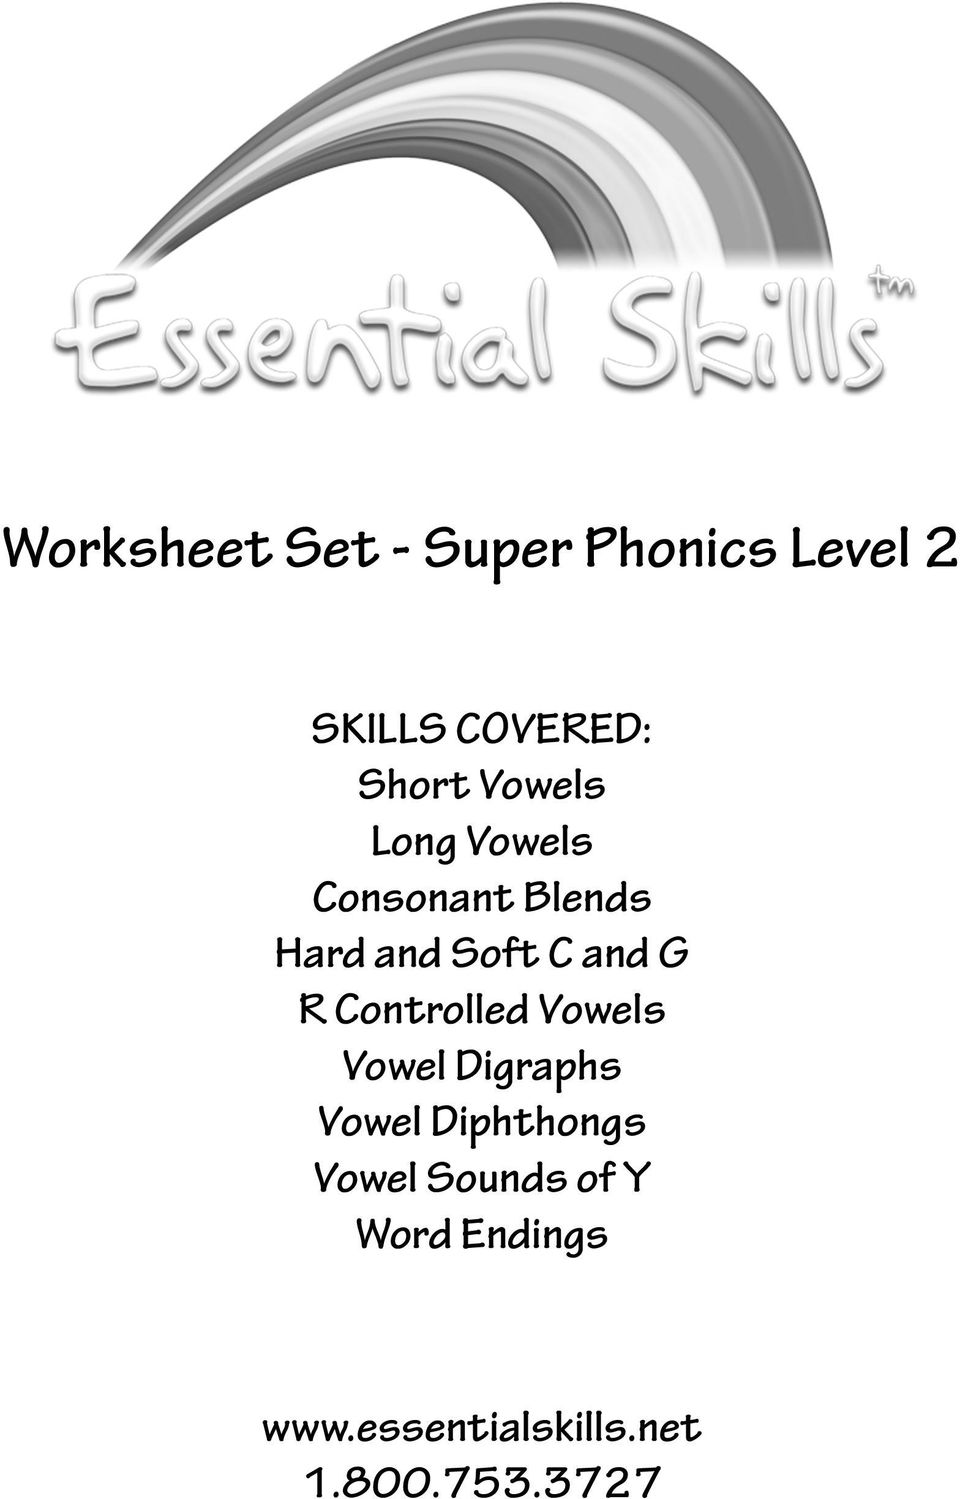 medium resolution of Worksheet Set - Super Phonics Level 2 - PDF Free Download